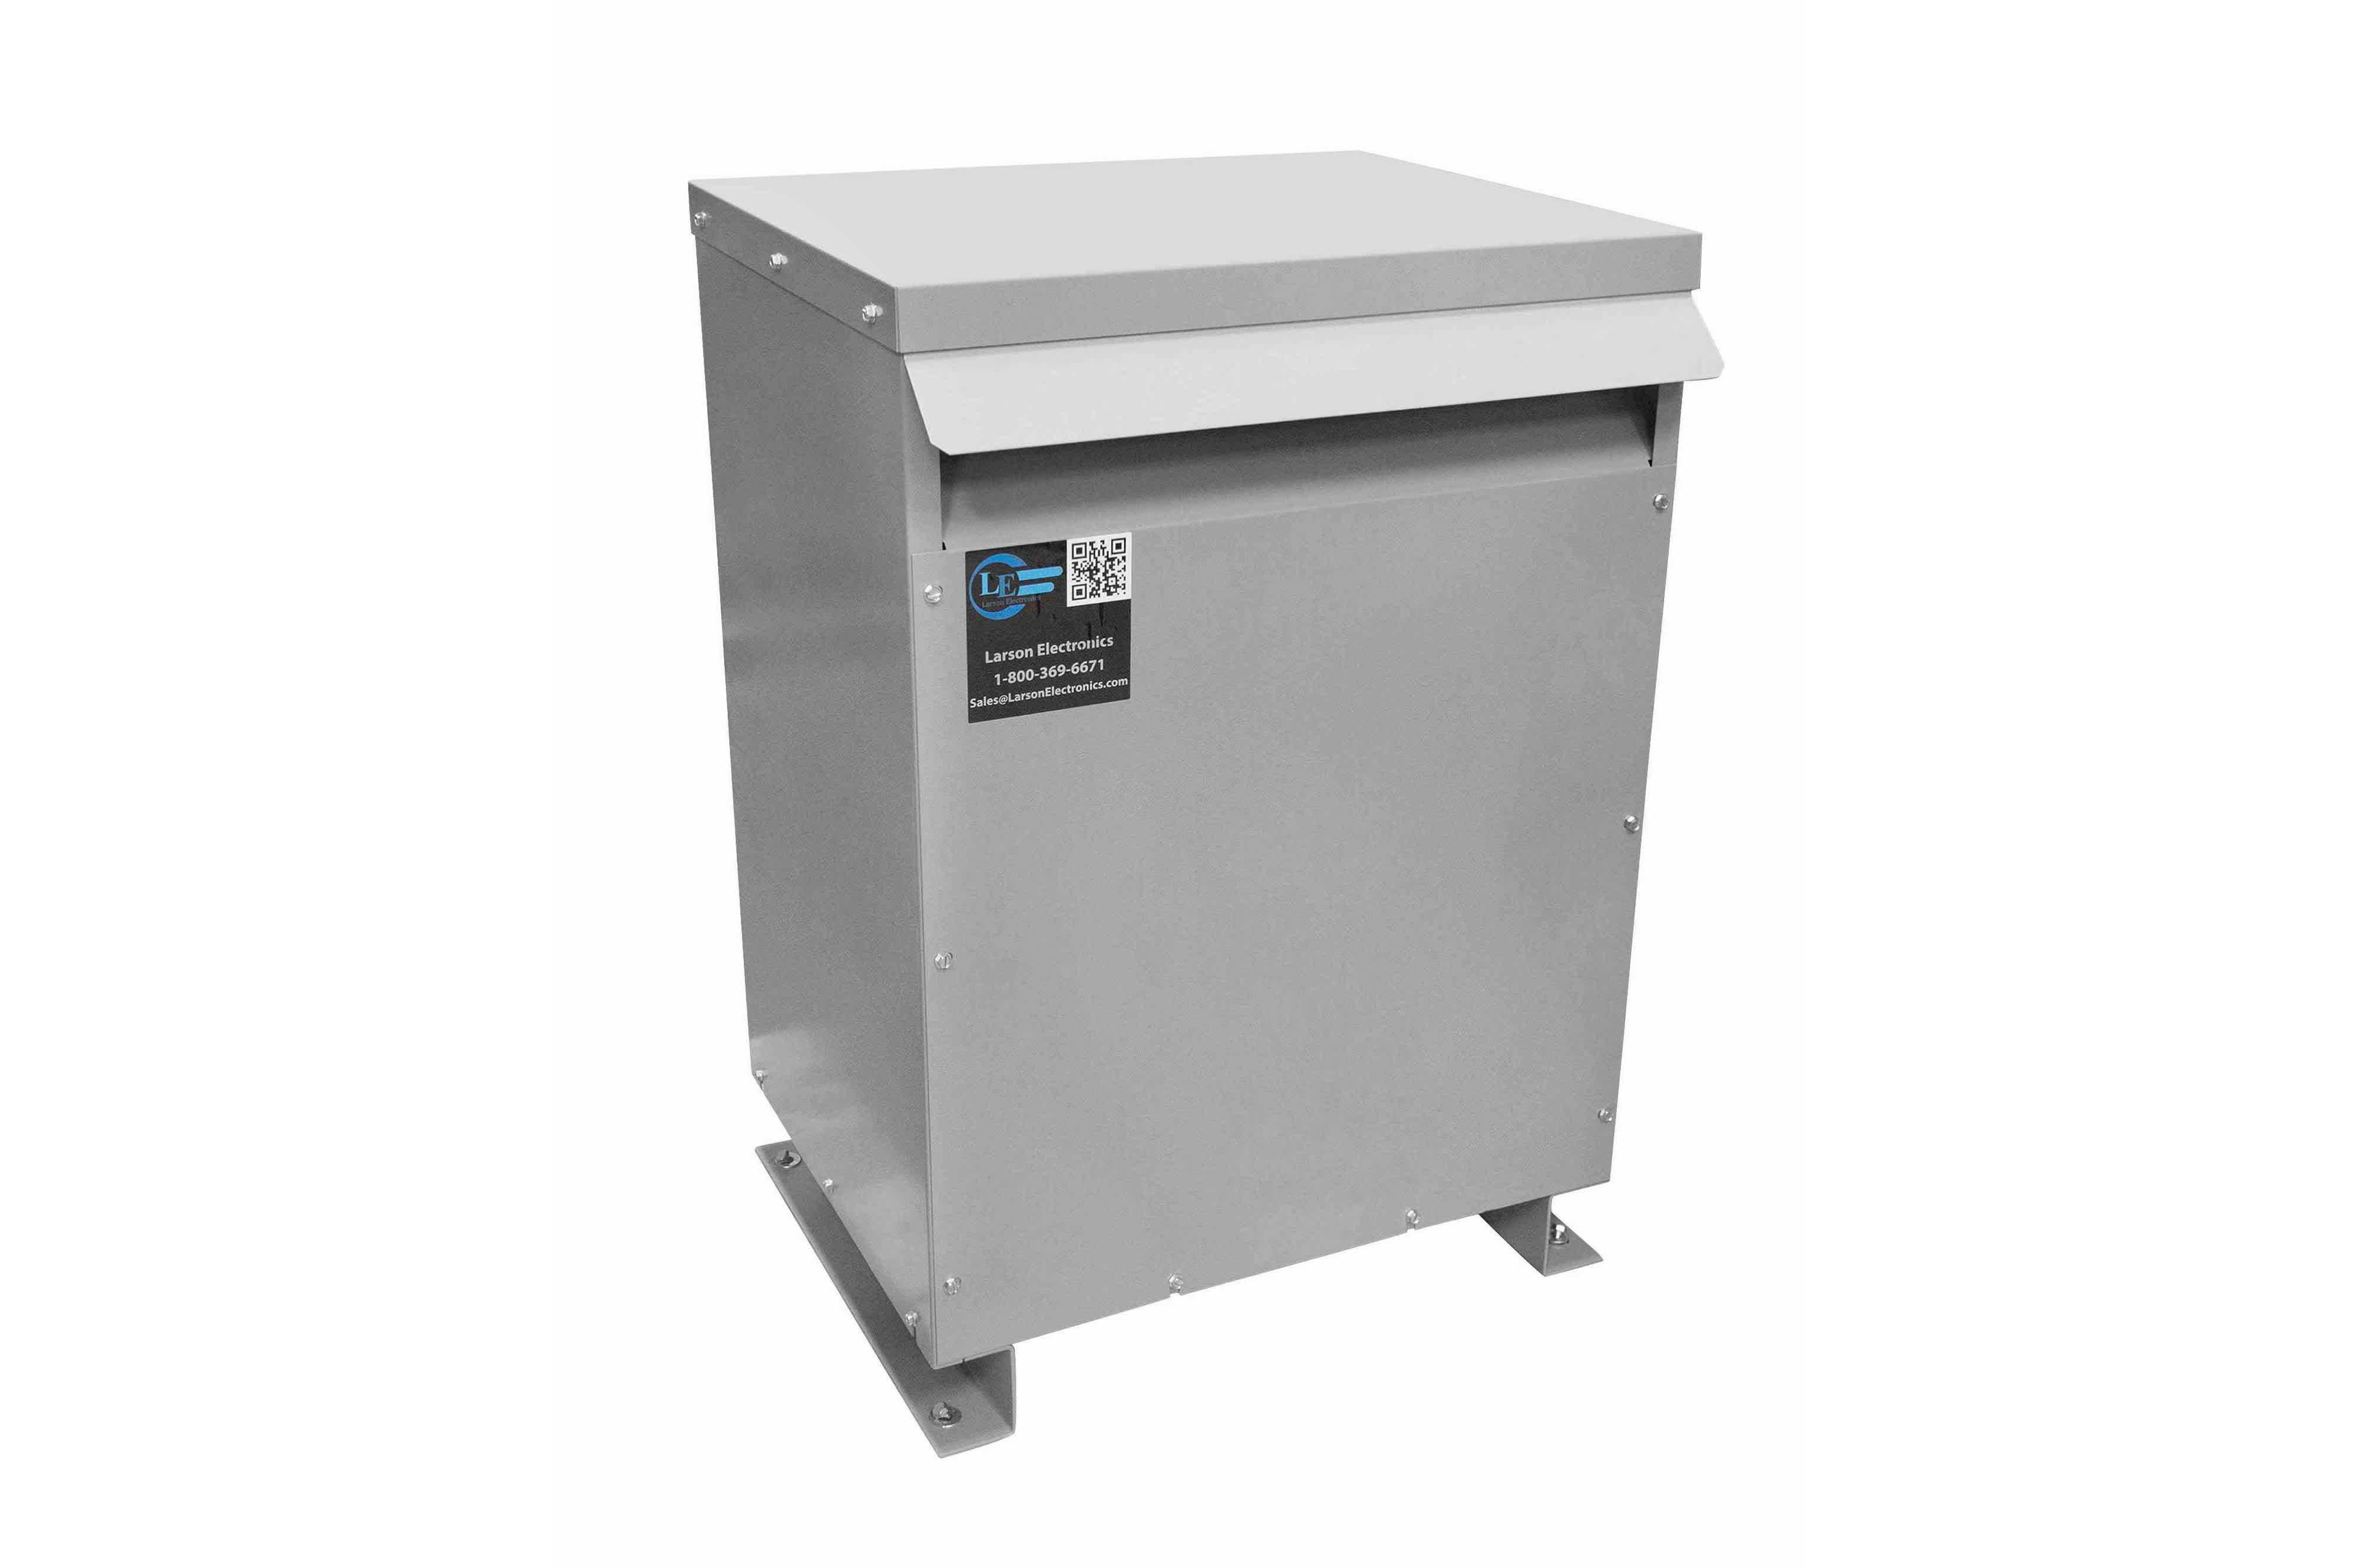 237.5 kVA 3PH Isolation Transformer, 600V Wye Primary, 415V Delta Secondary, N3R, Ventilated, 60 Hz